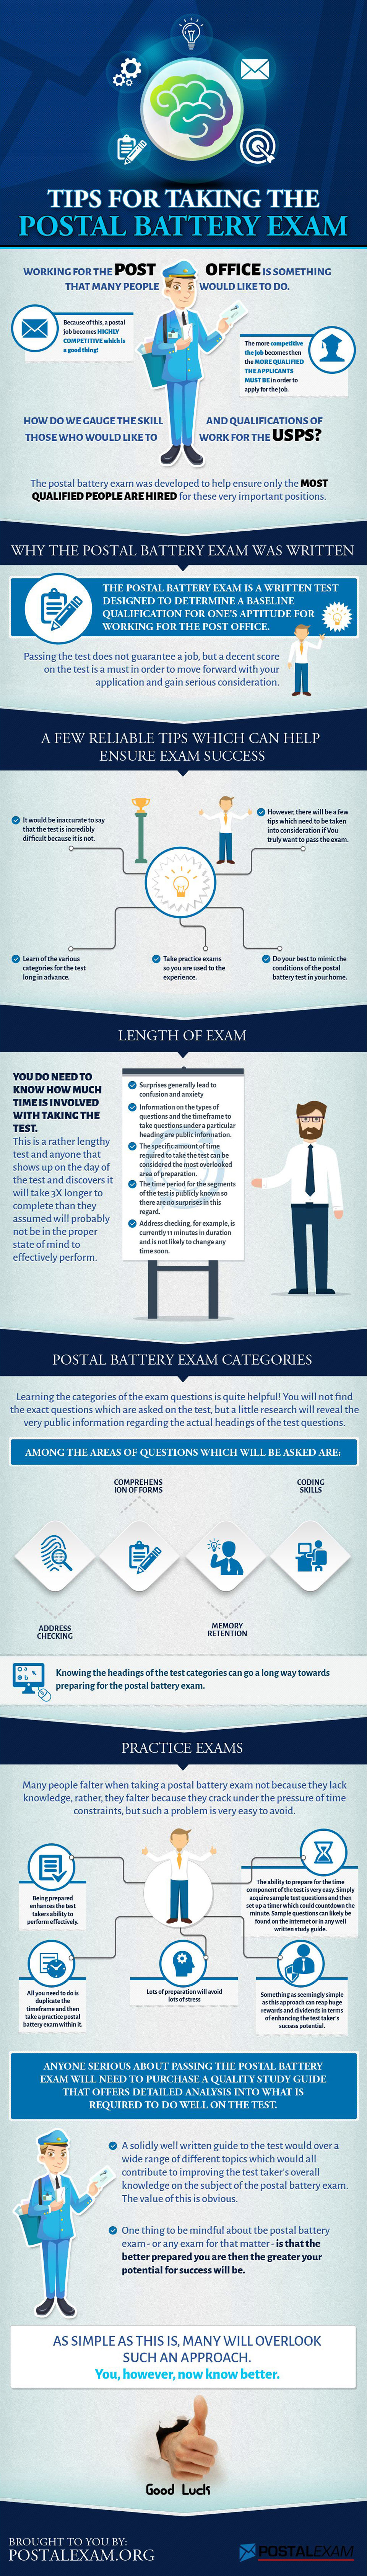 Postal Battery Exam